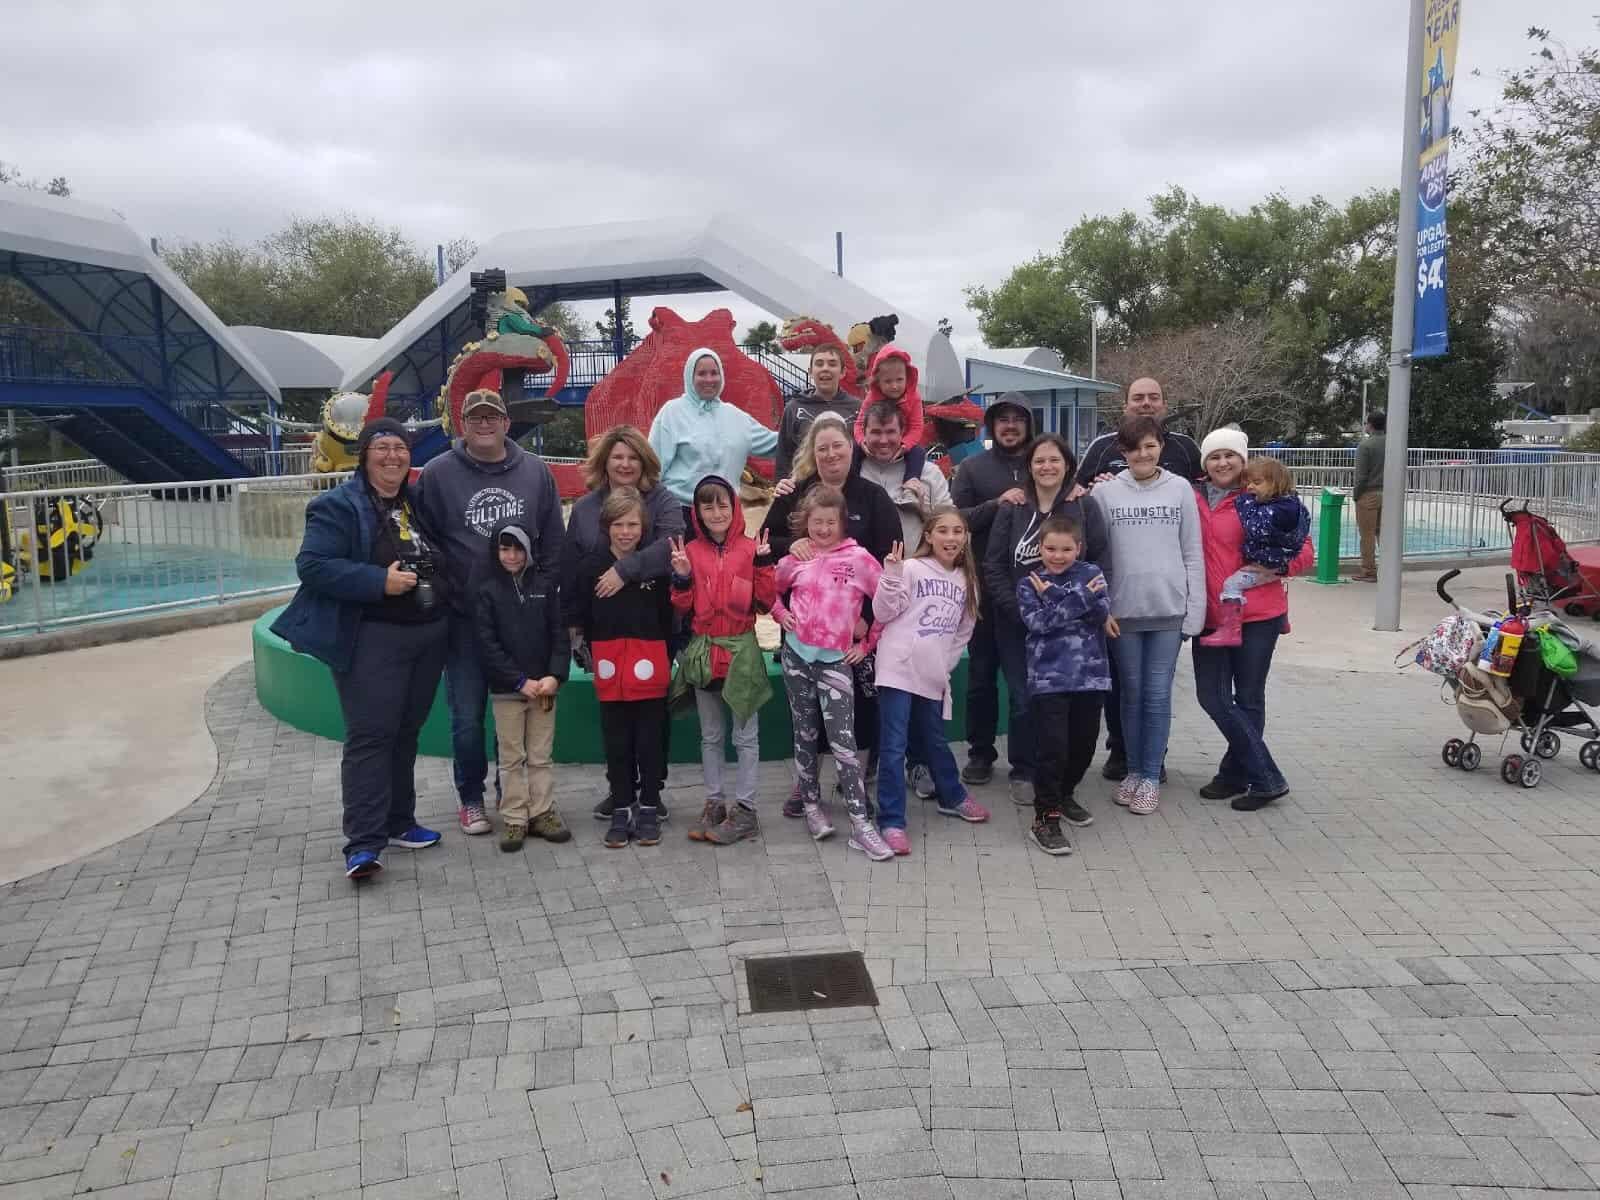 Fulltime Families Storms Legoland, FL 2020